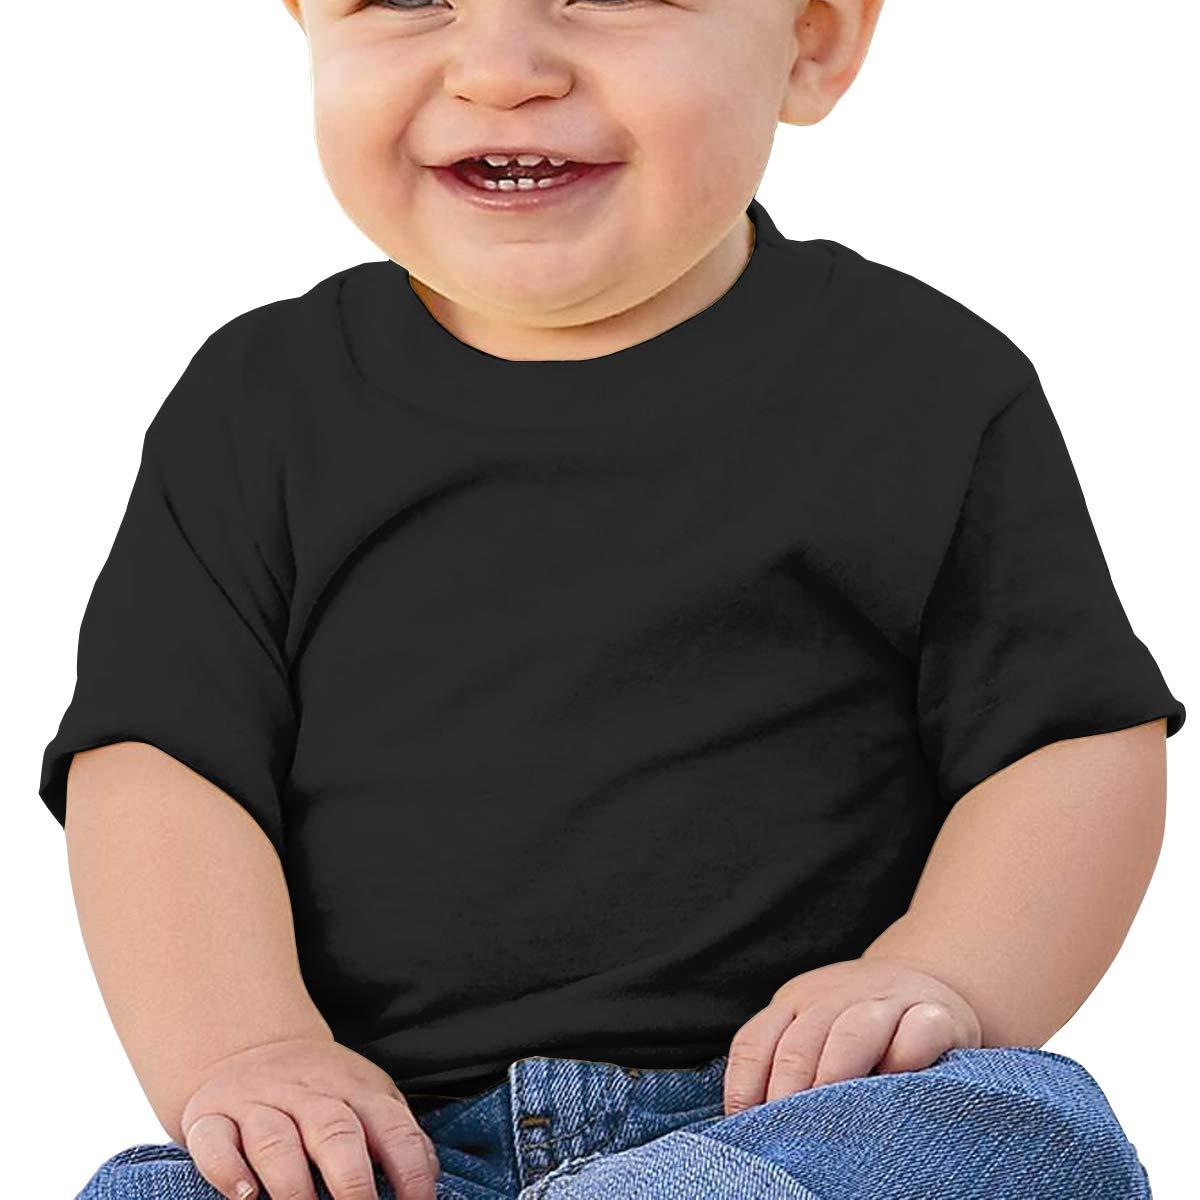 Jcaic Rinaa 9th Division Vietnam Veteran Toddler Short-Sleeve Tee for Boy Girl Infant Kids T-Shirt On Newborn 6-18 Months